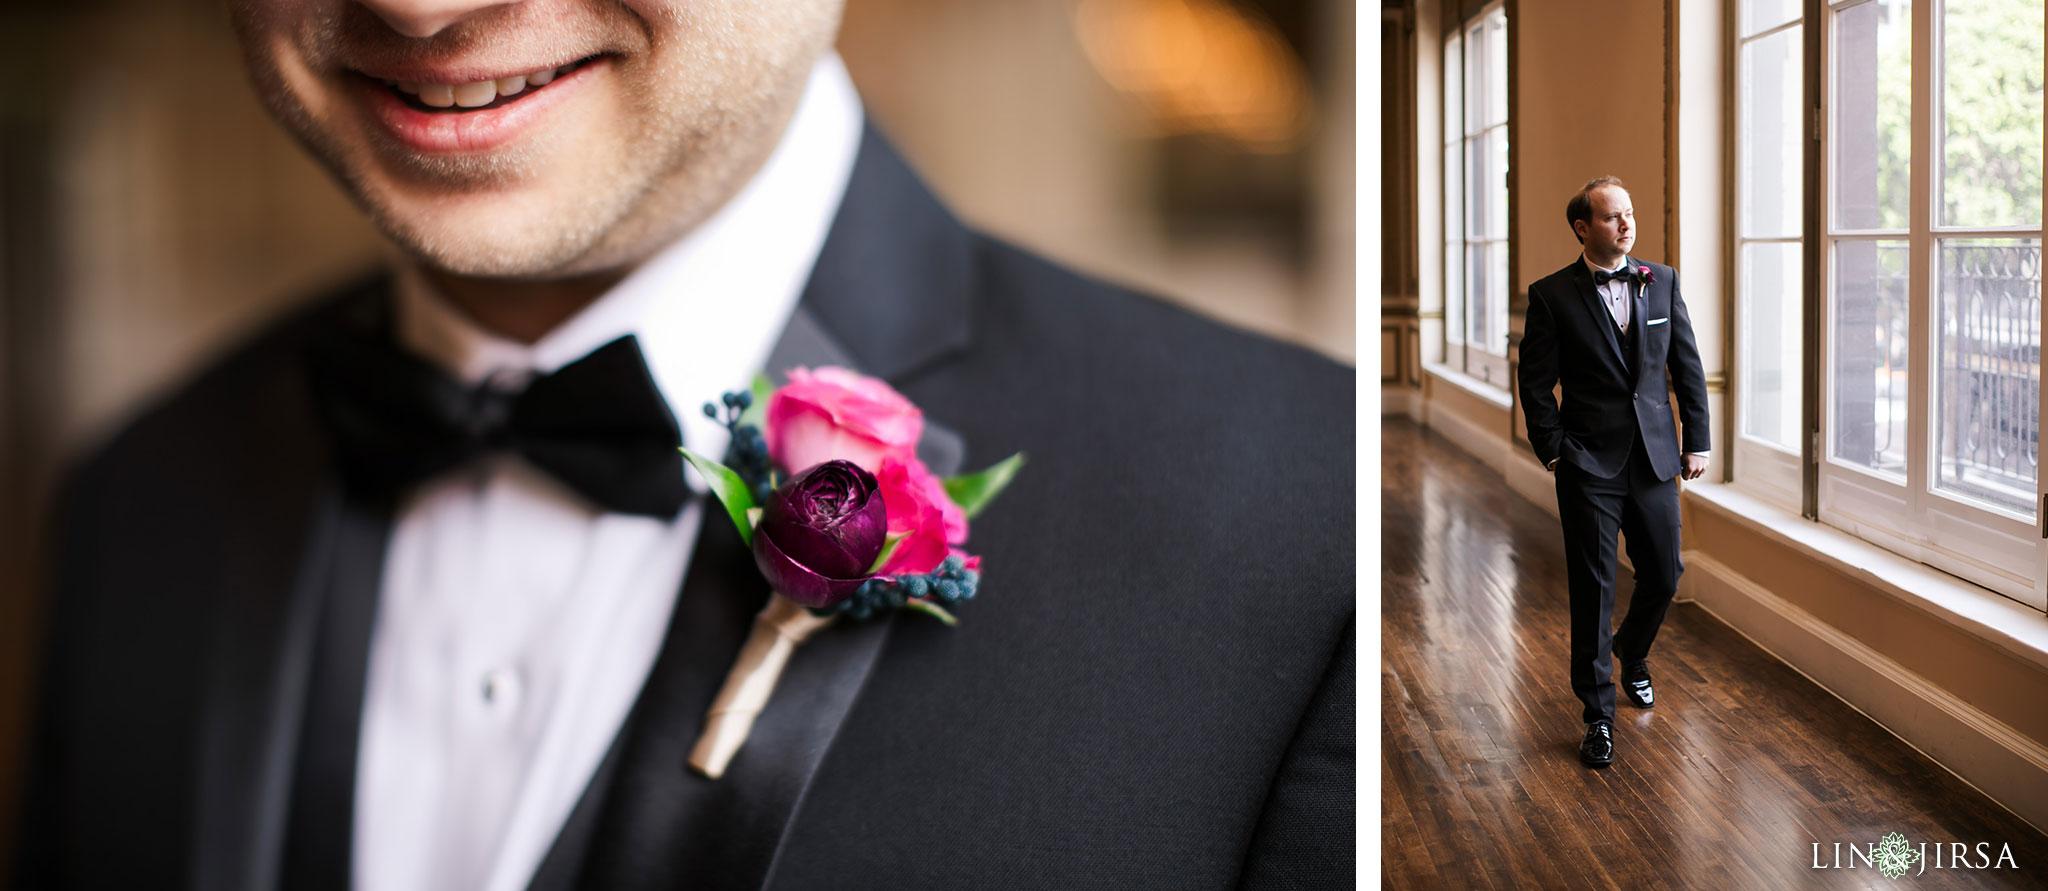 08 Alexandria Ballrooms Los Angeles Jewish Wedding Photography